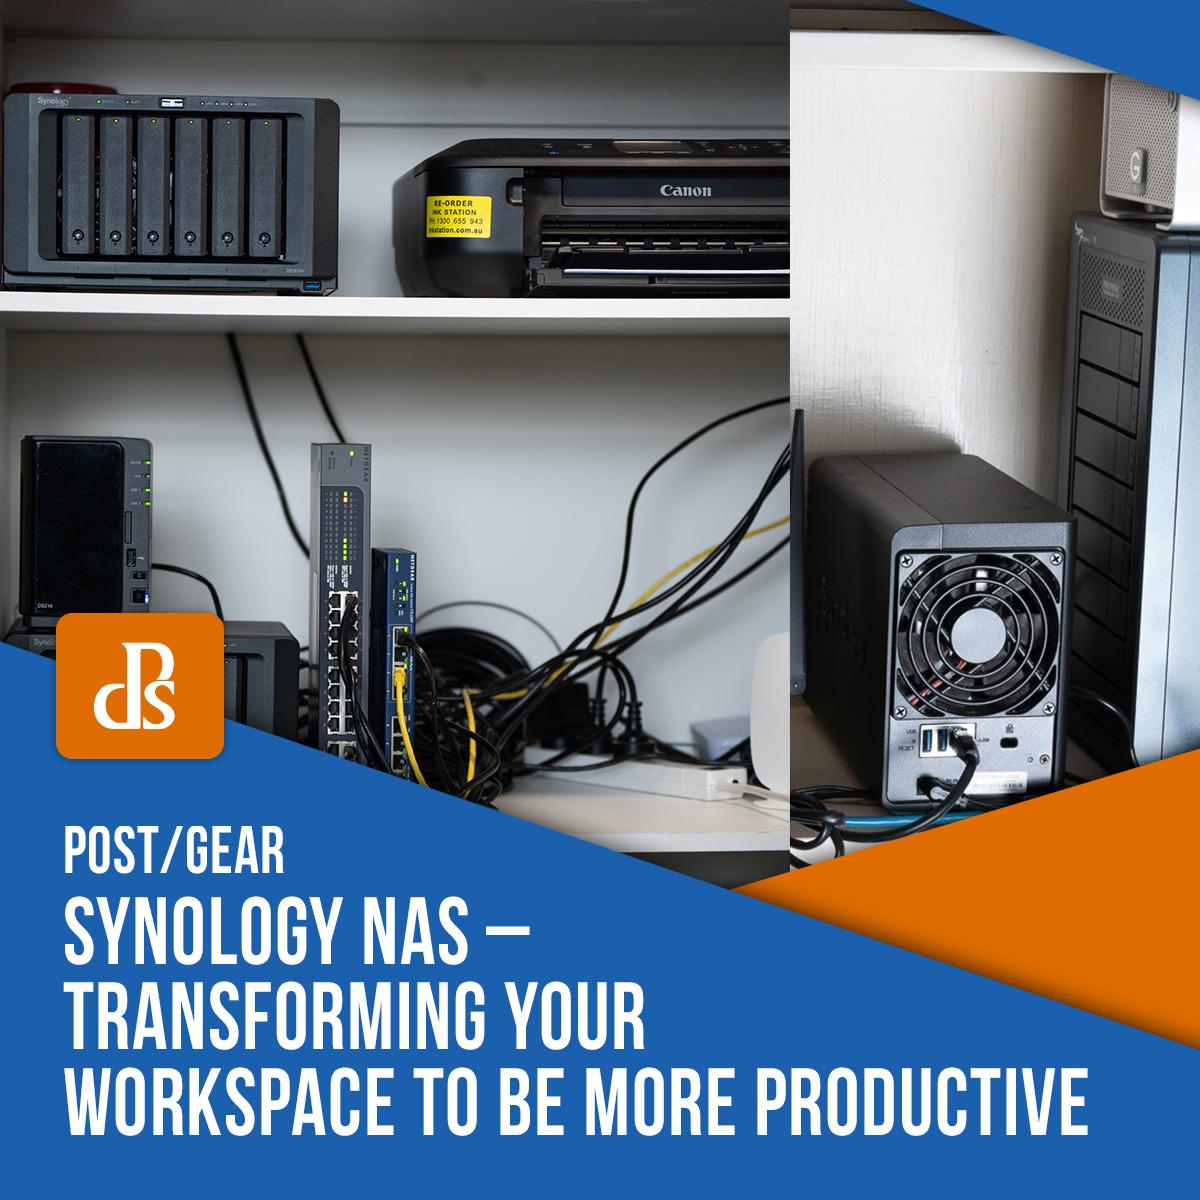 Synology NAS storage